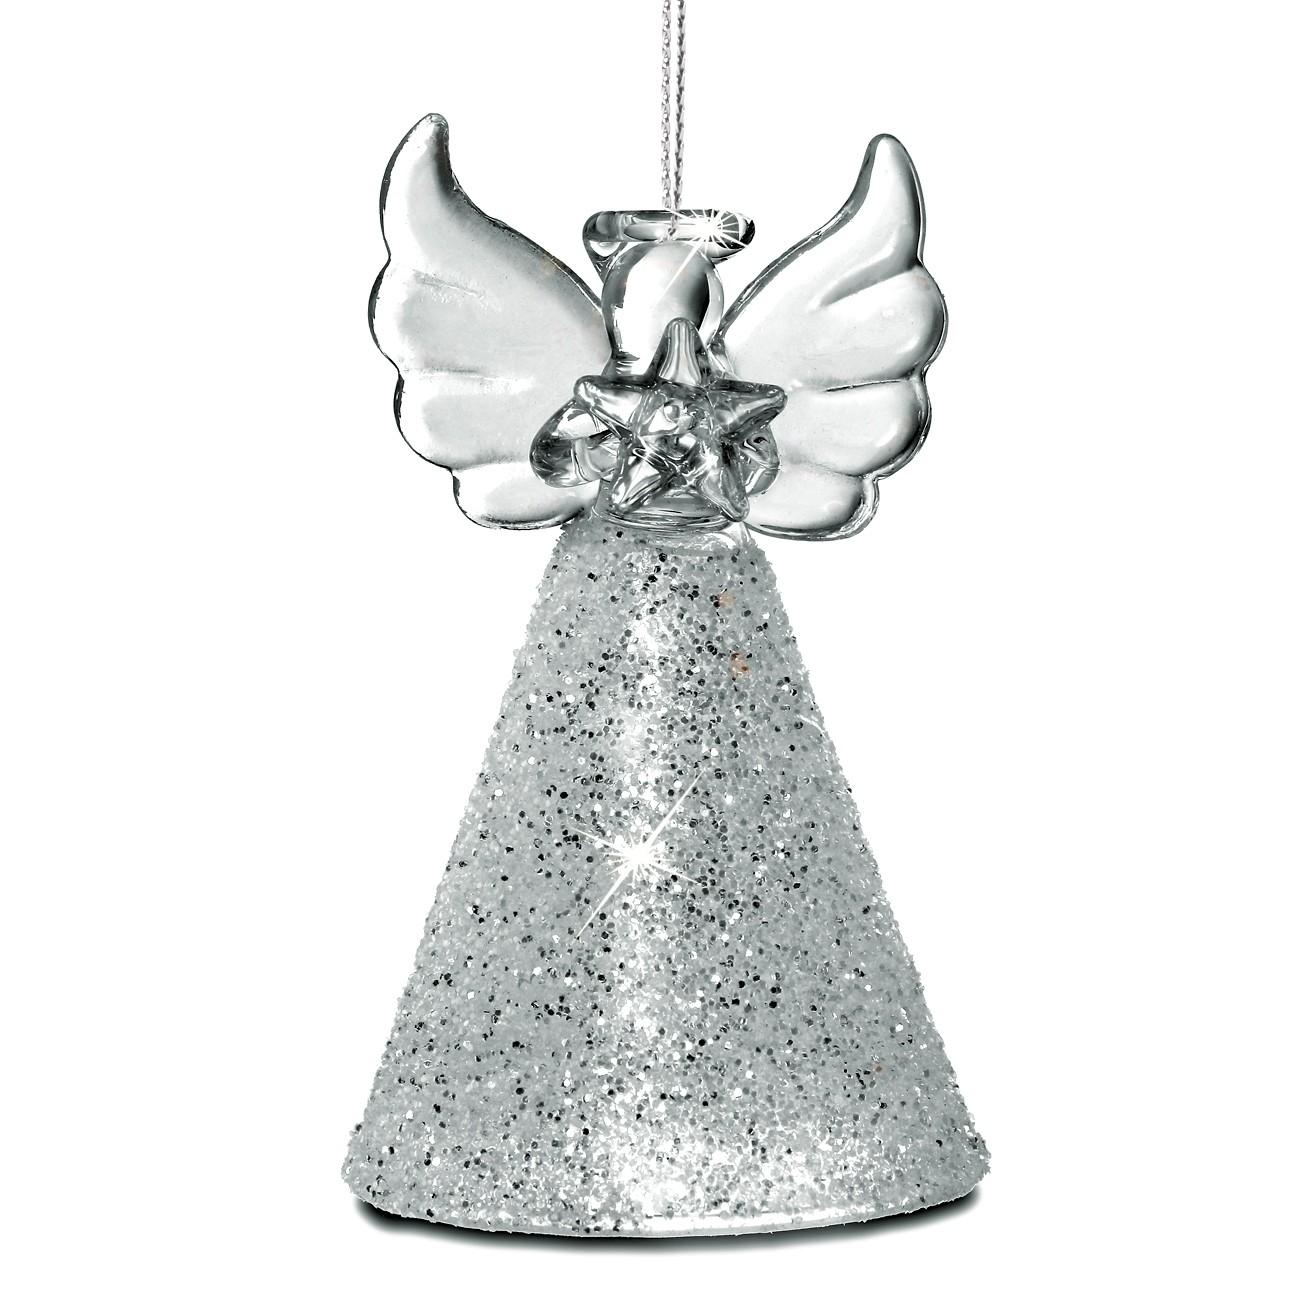 sikora christbaumschmuck aus glas engel mit silberglitter 3er set h 7cm christbaumschmuck. Black Bedroom Furniture Sets. Home Design Ideas